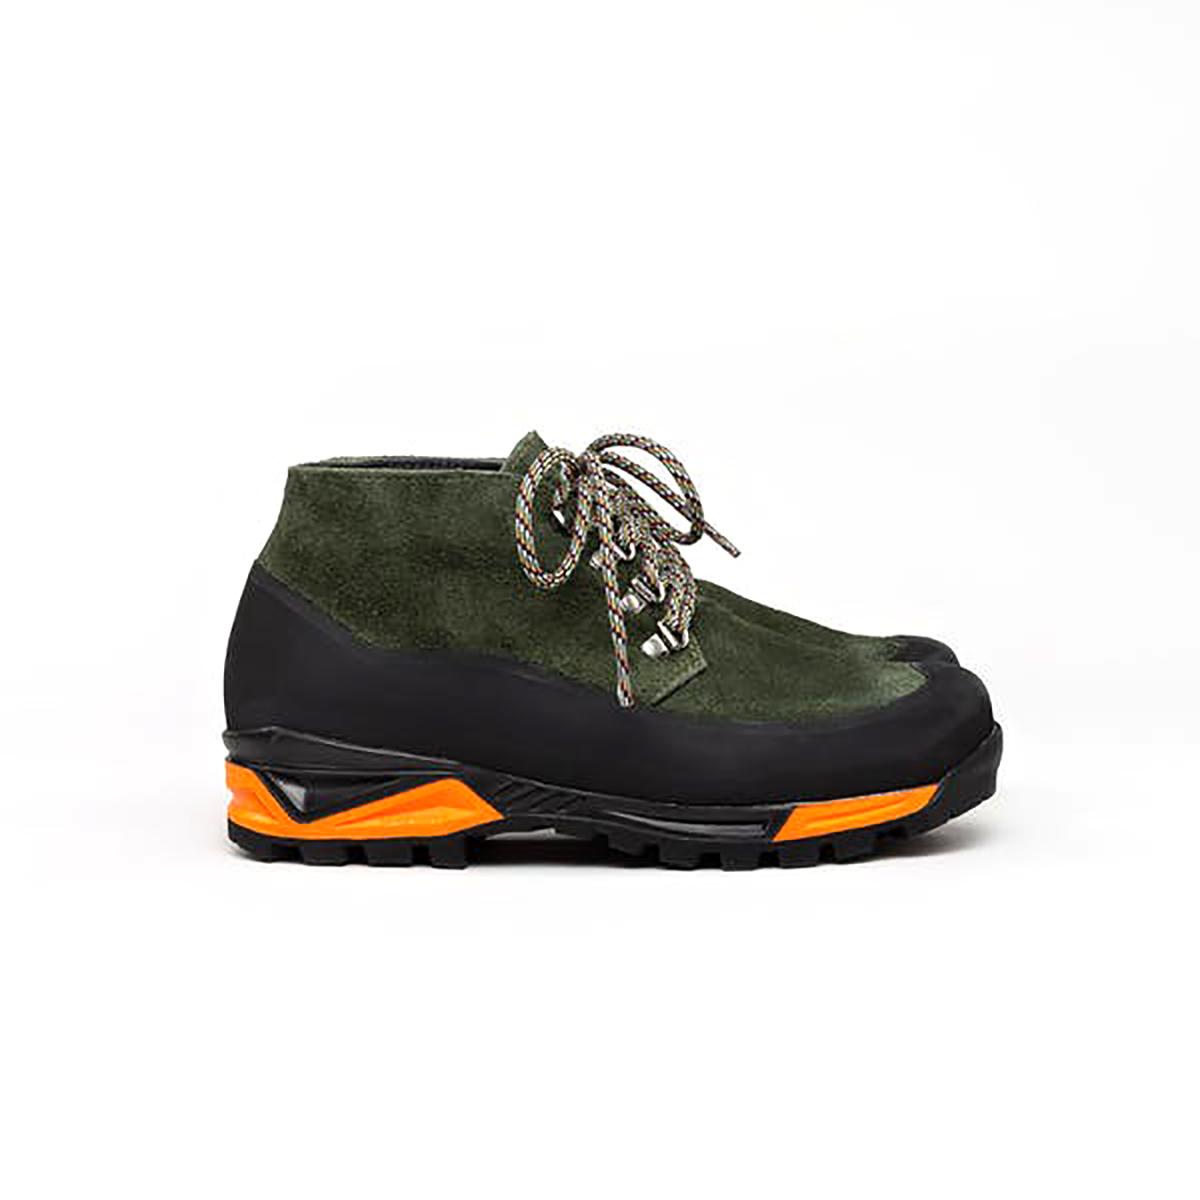 høst sko 2